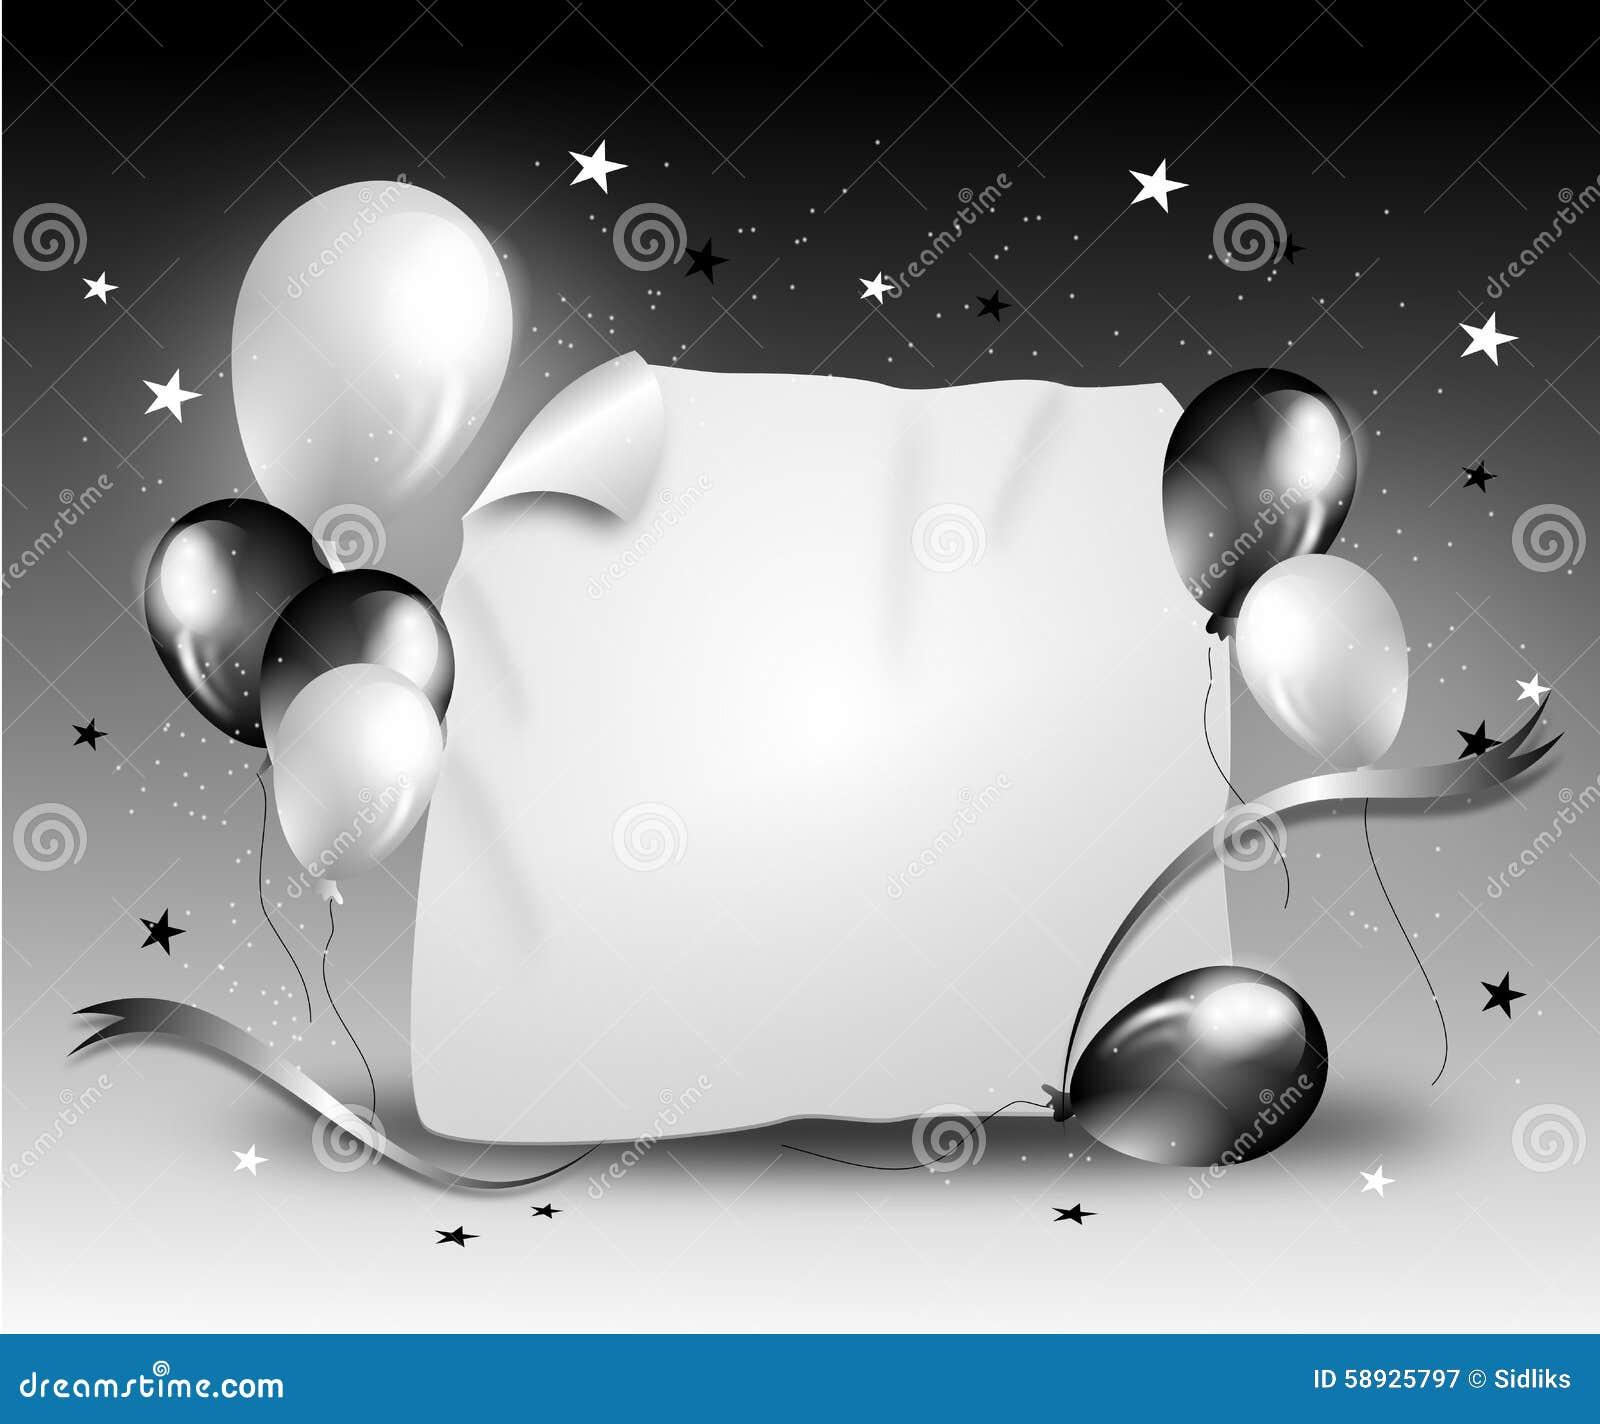 black white party background stock illustration illustration of